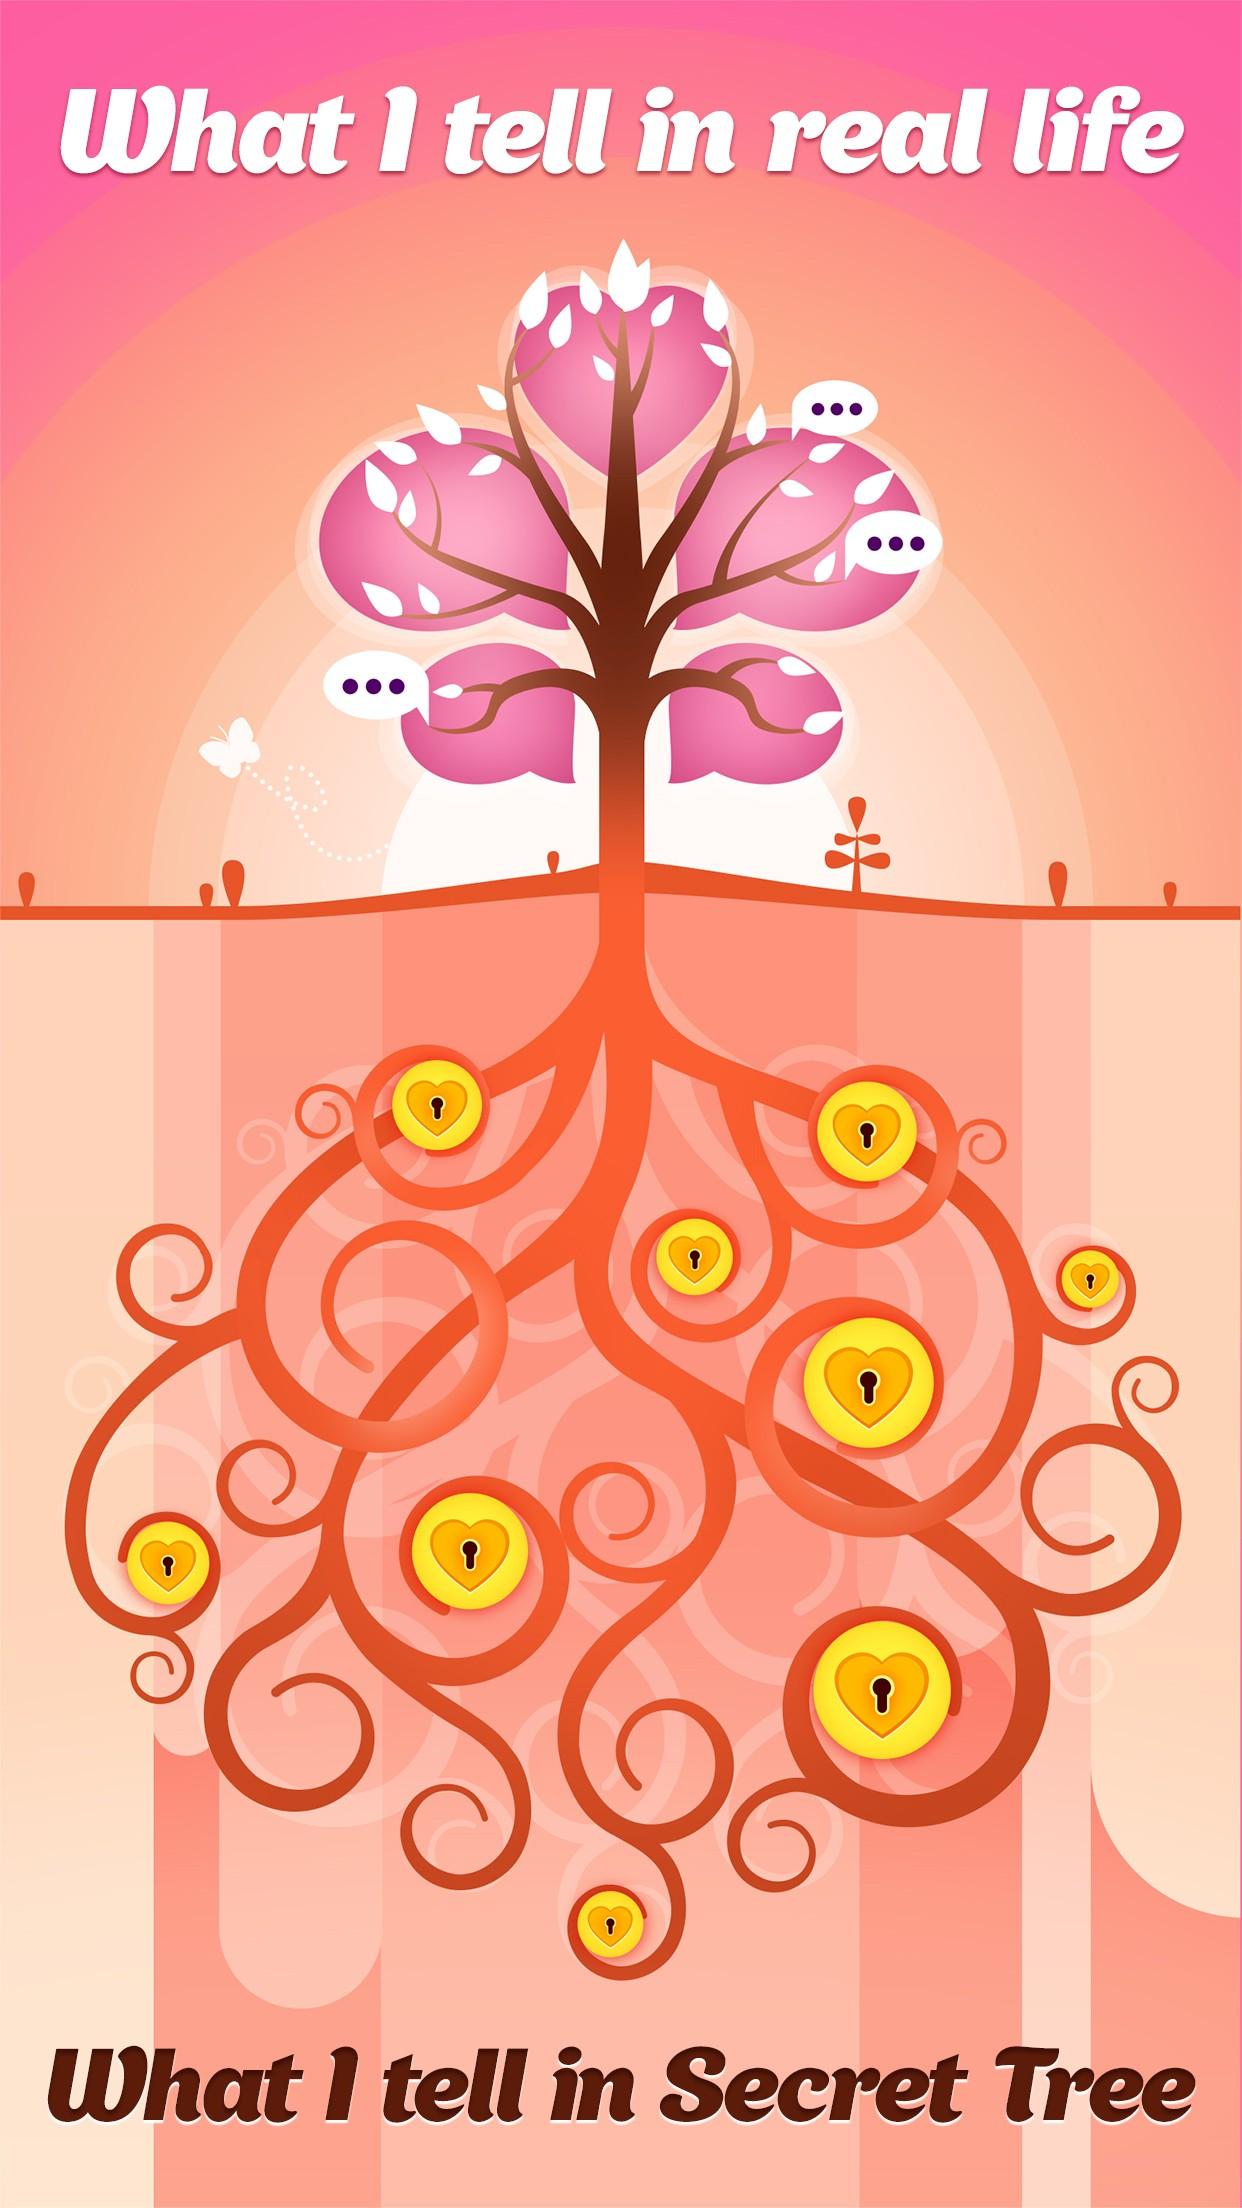 Secret Tree - Spread The Word